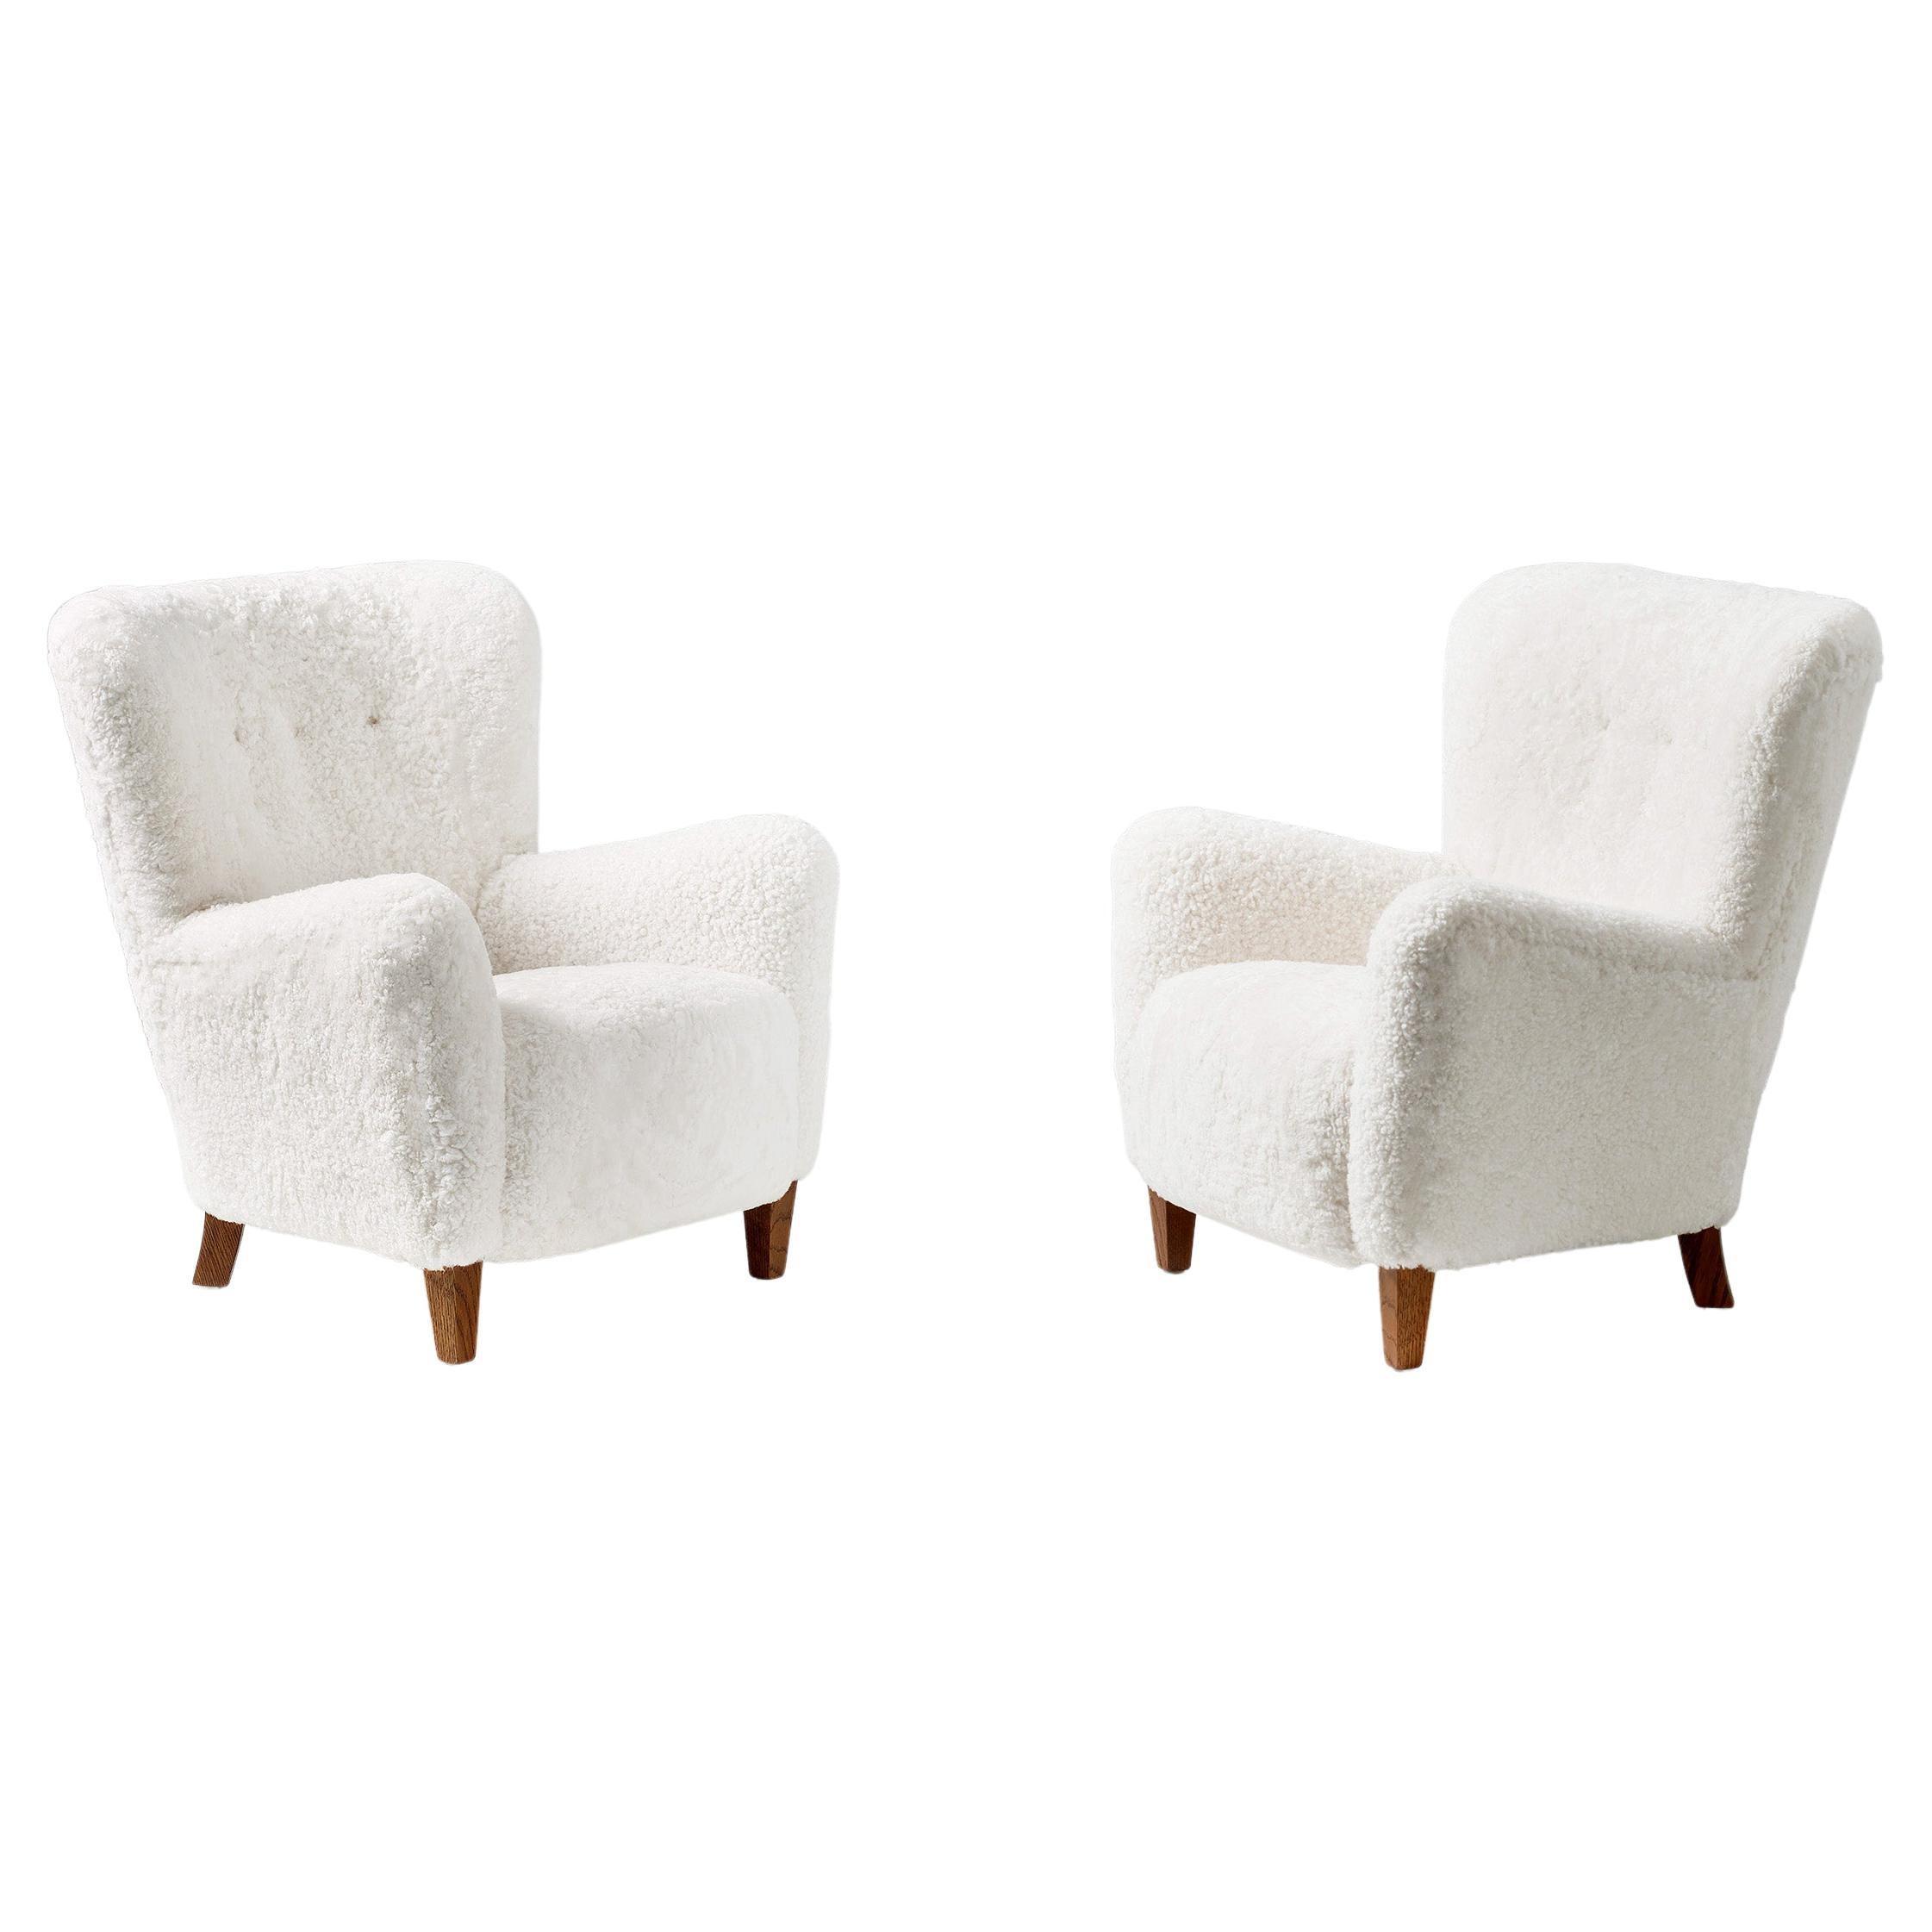 Custom Made 1940s Sheepskin Lounge Chairs